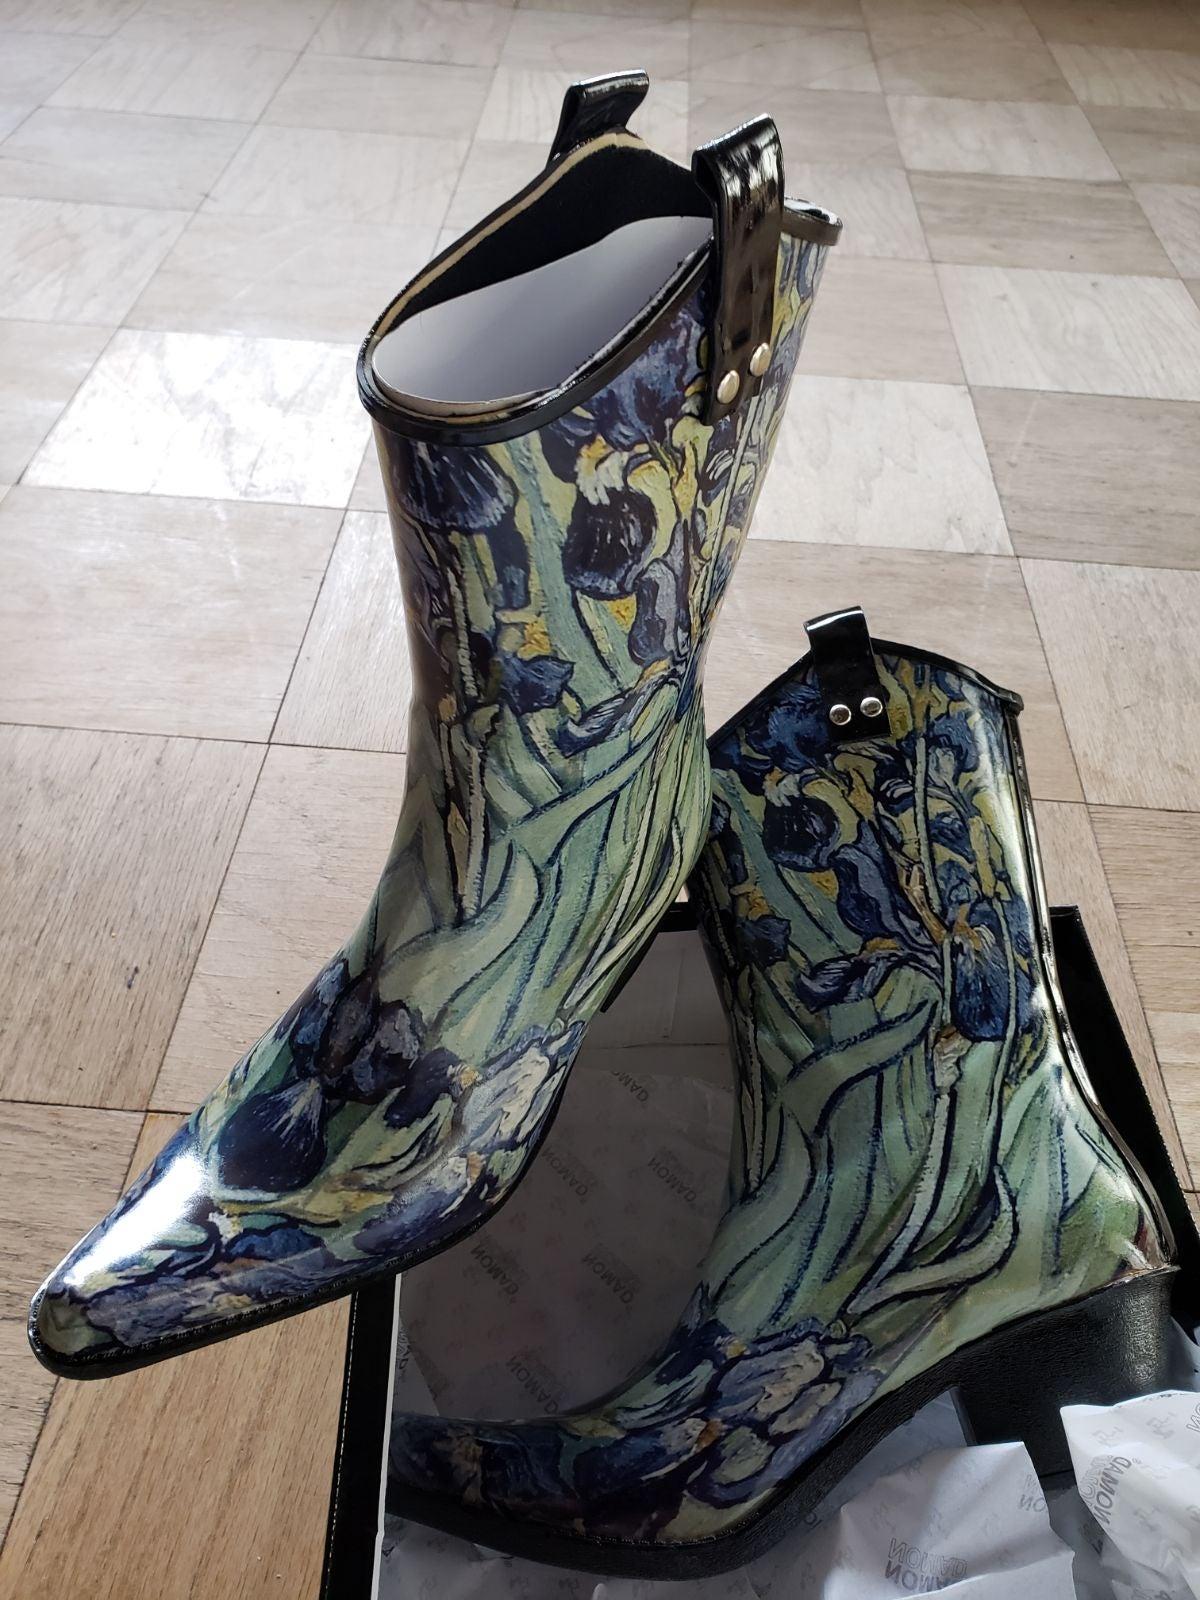 Rain cowboy boots